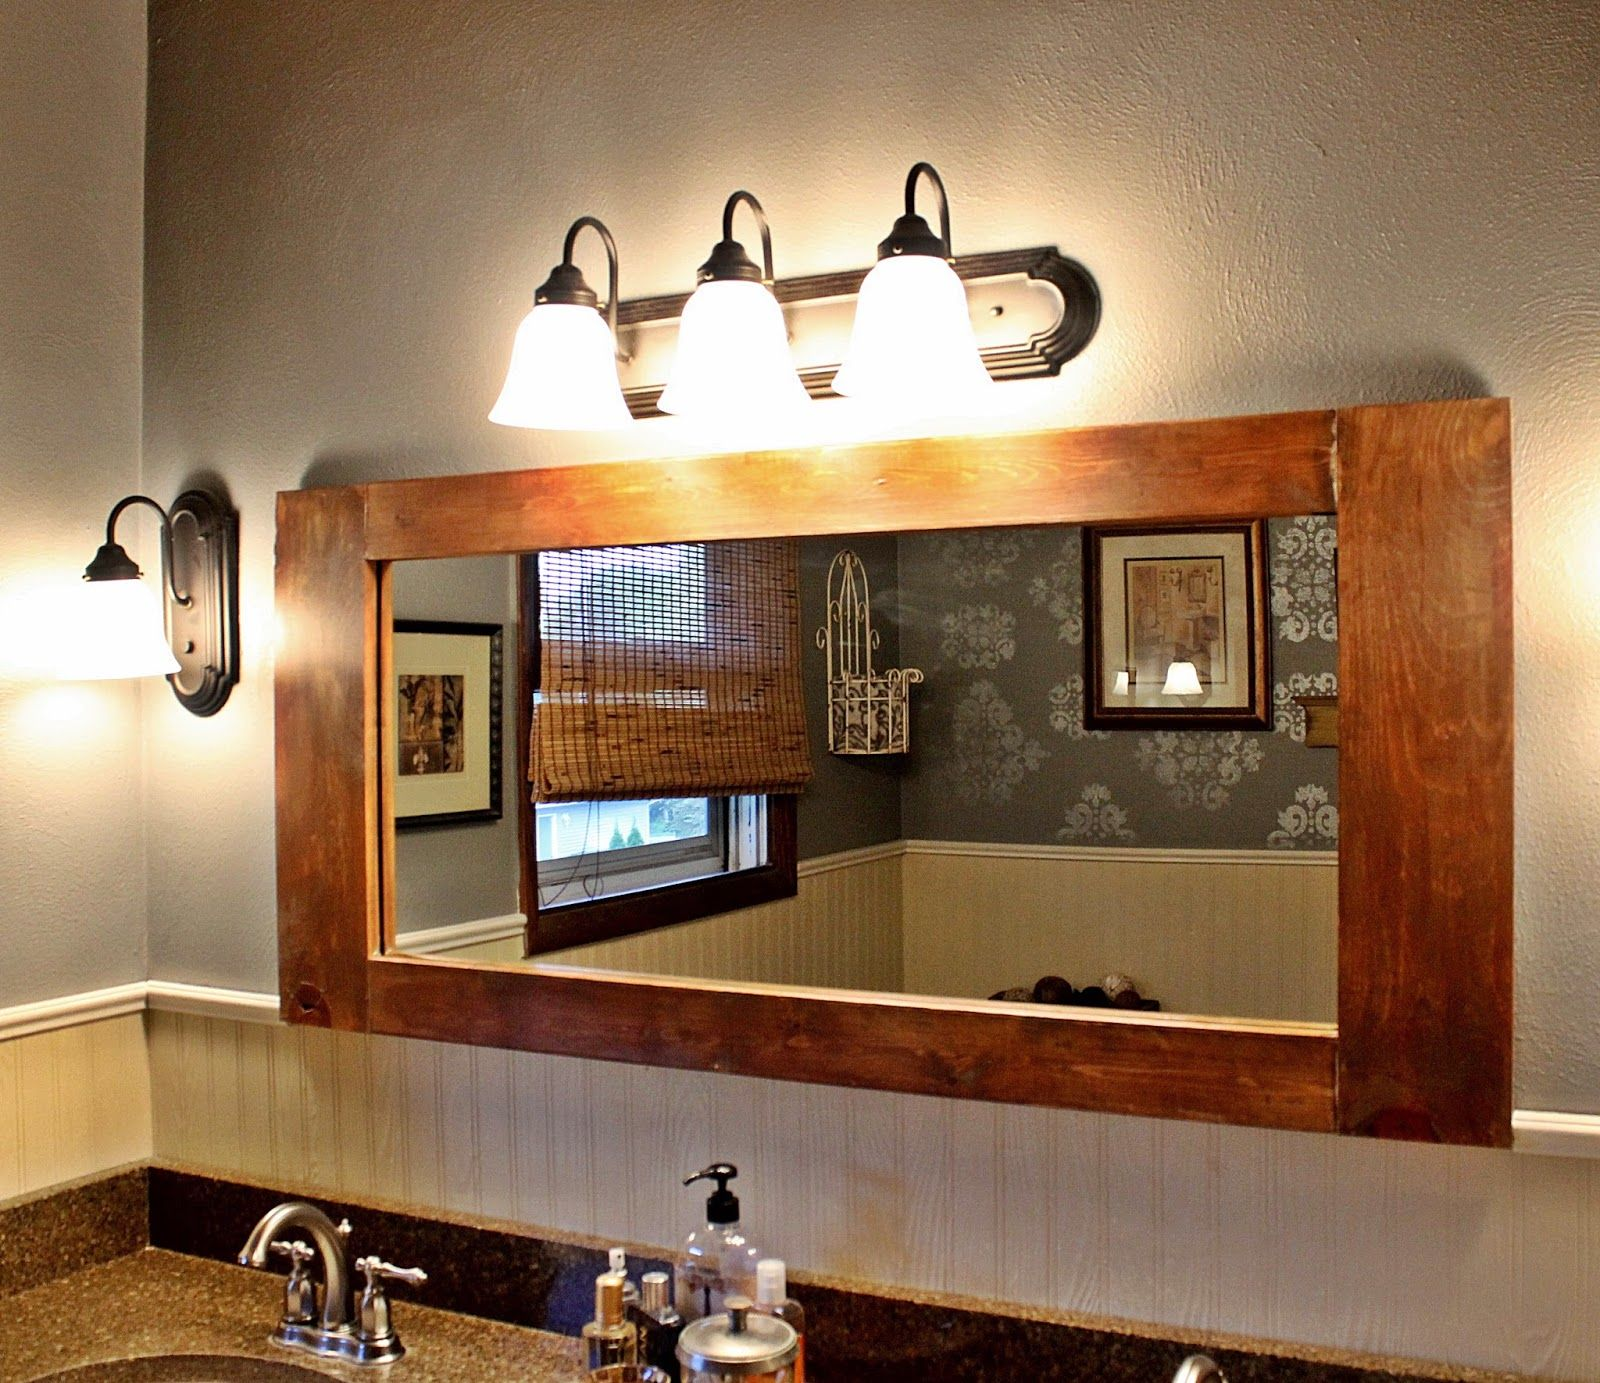 Bathroom Mirrors Under $50 large diy bathroom vanity mirror for under $50 - the decorating